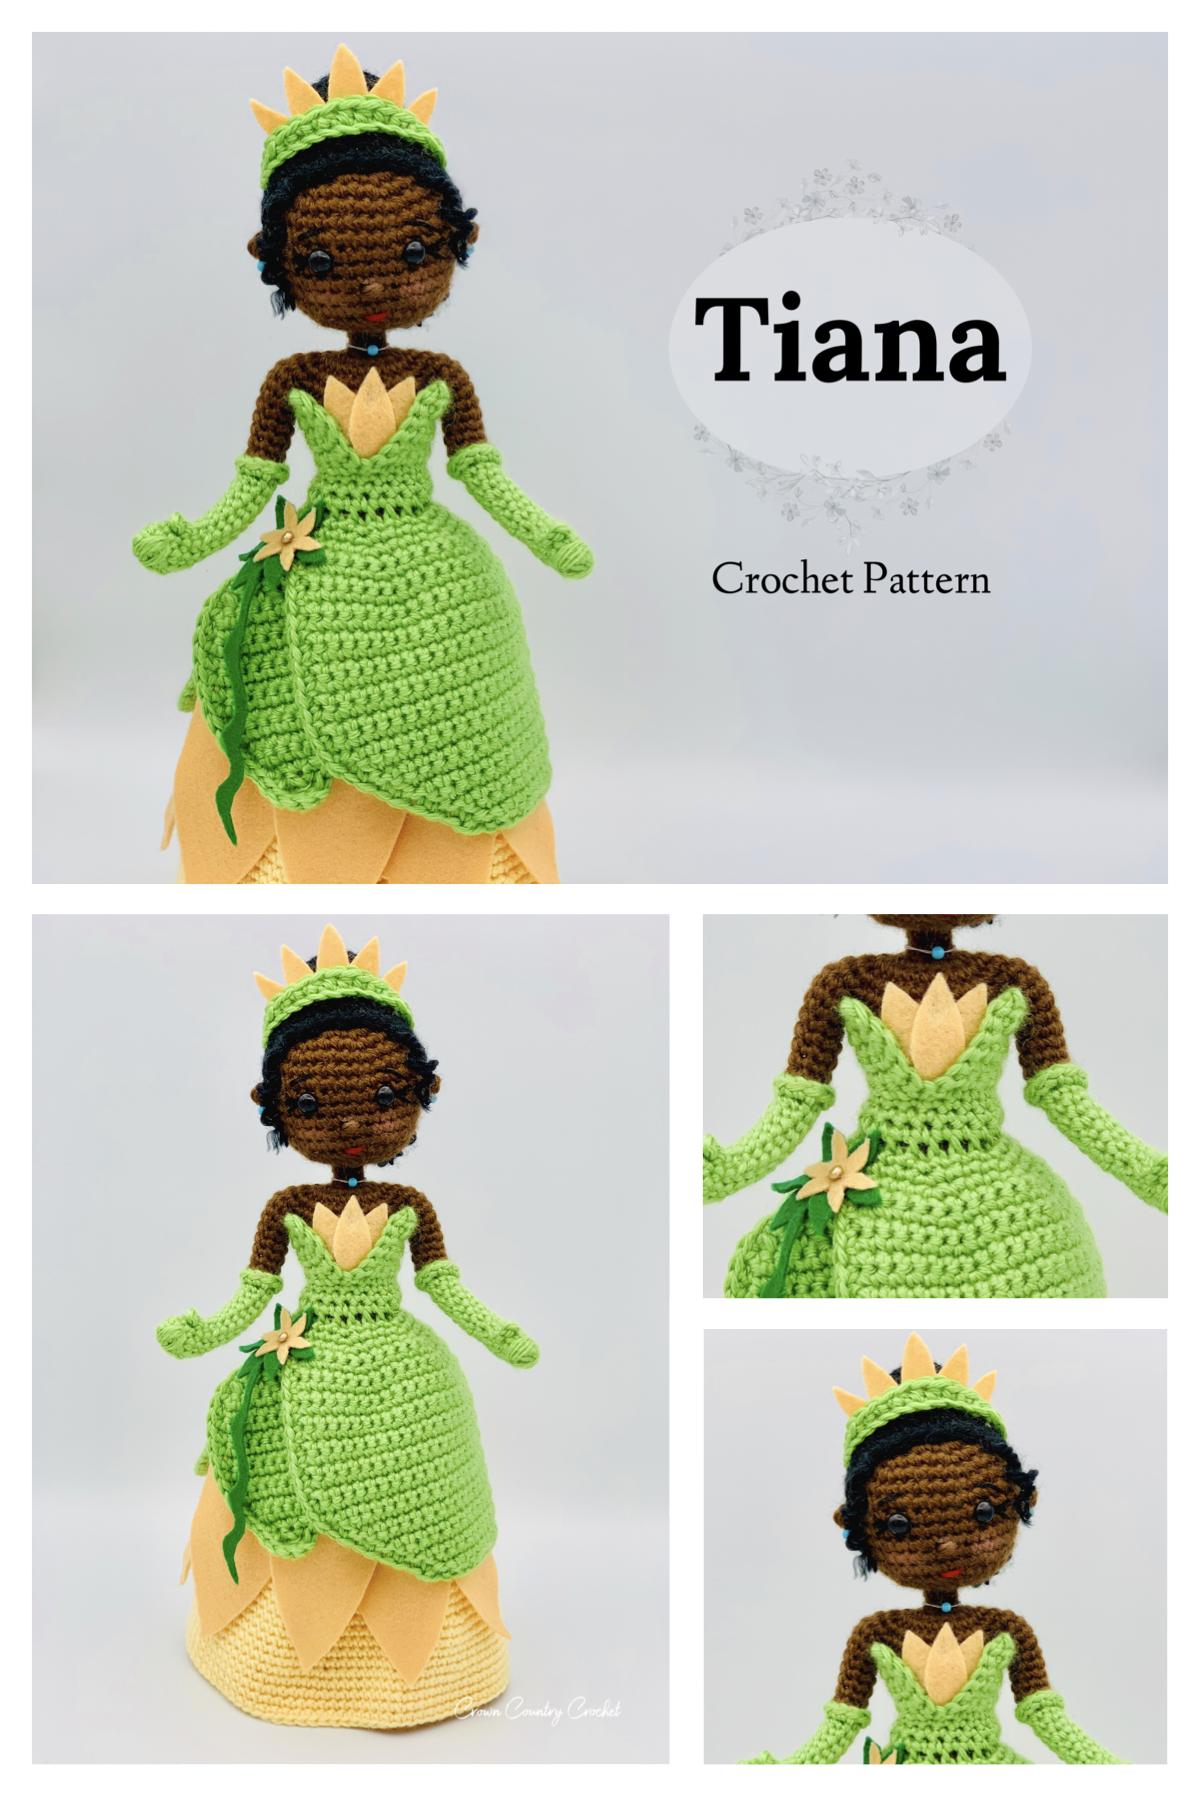 Our Favorite Pinterest Crochet Patterns | Crochet projects ... | 1800x1200